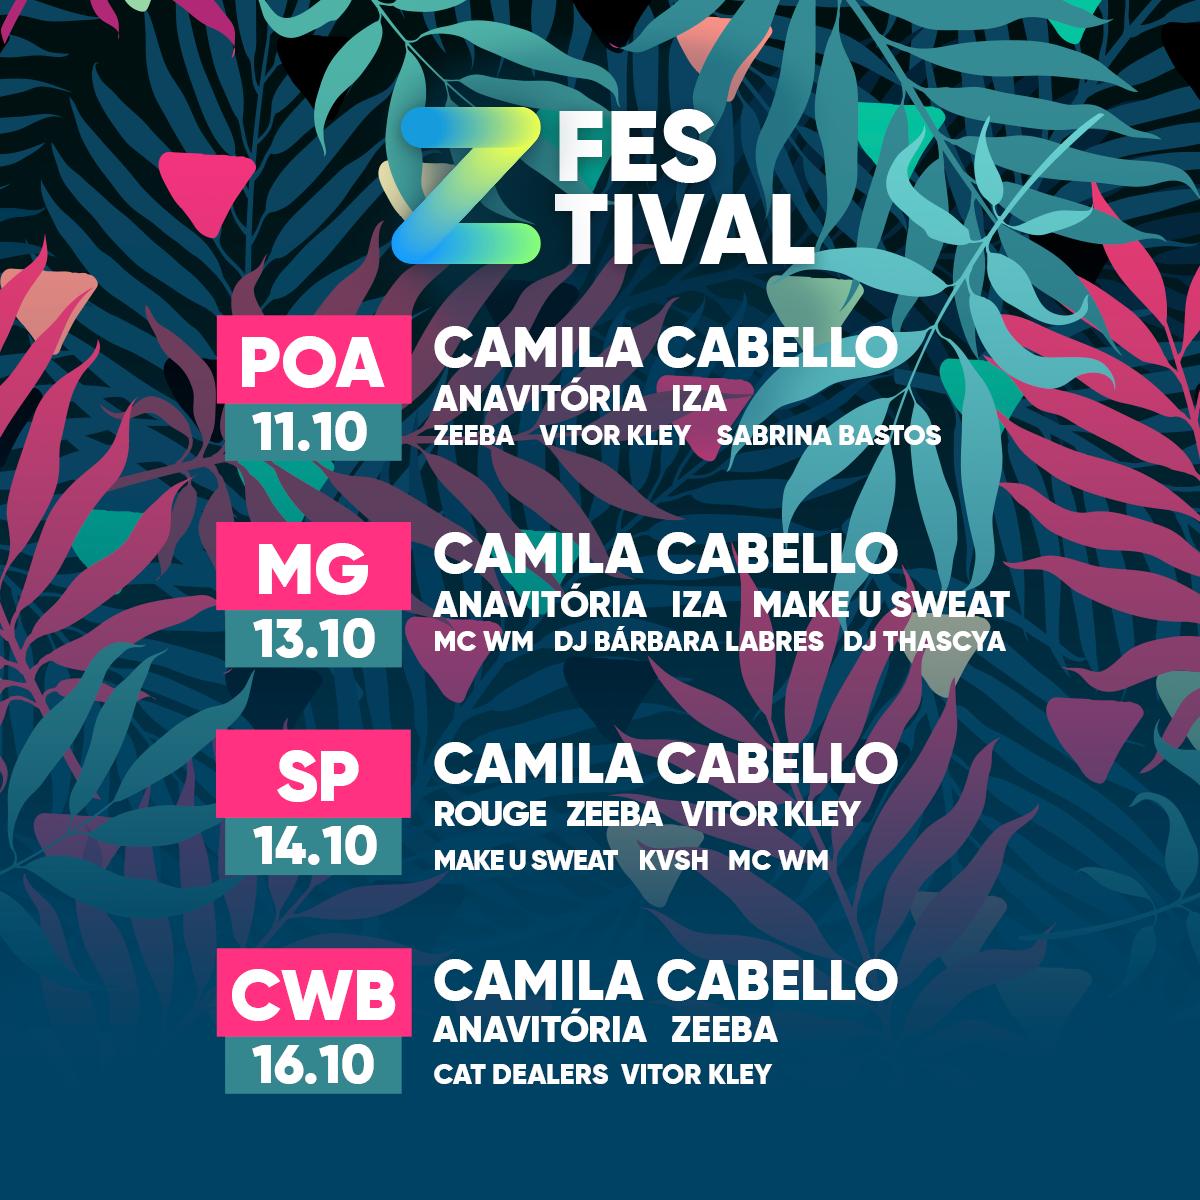 Z Festival LineUP